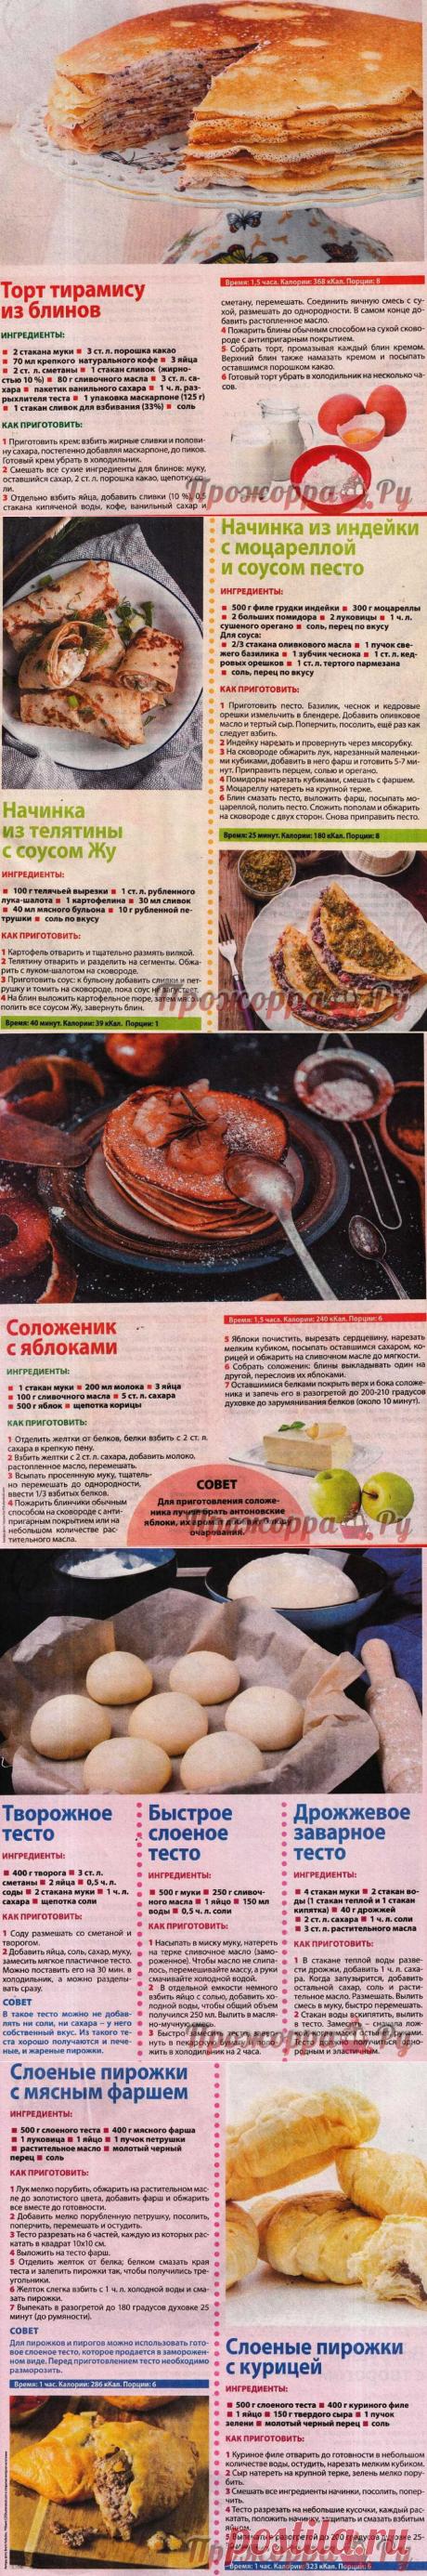 Блинчики 2 | Прожоpра.РуПрожоpра.Ру